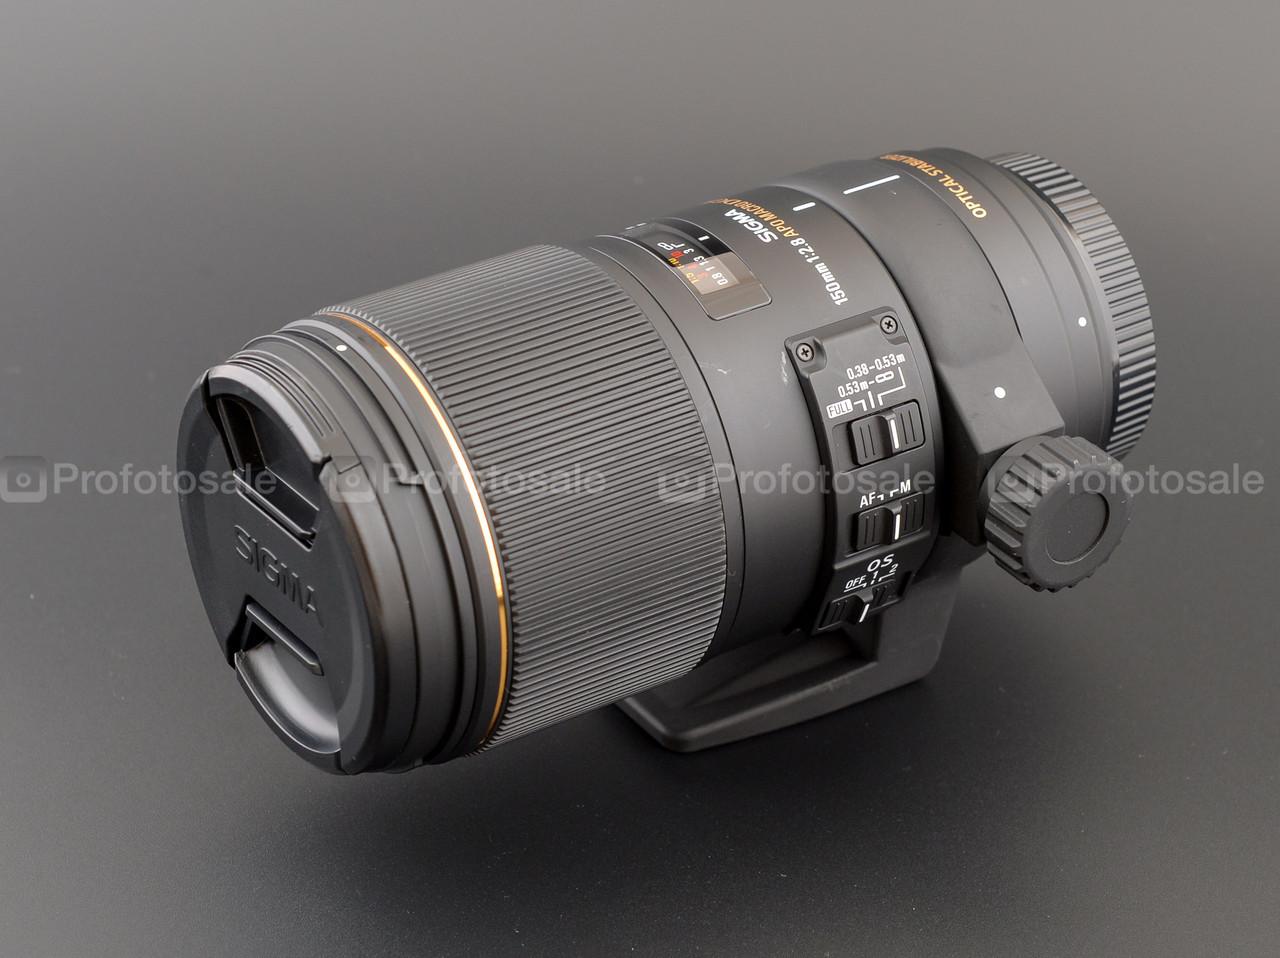 Sigma APO Macro 150mm f/2.8 EX DG OS HSM для Canon